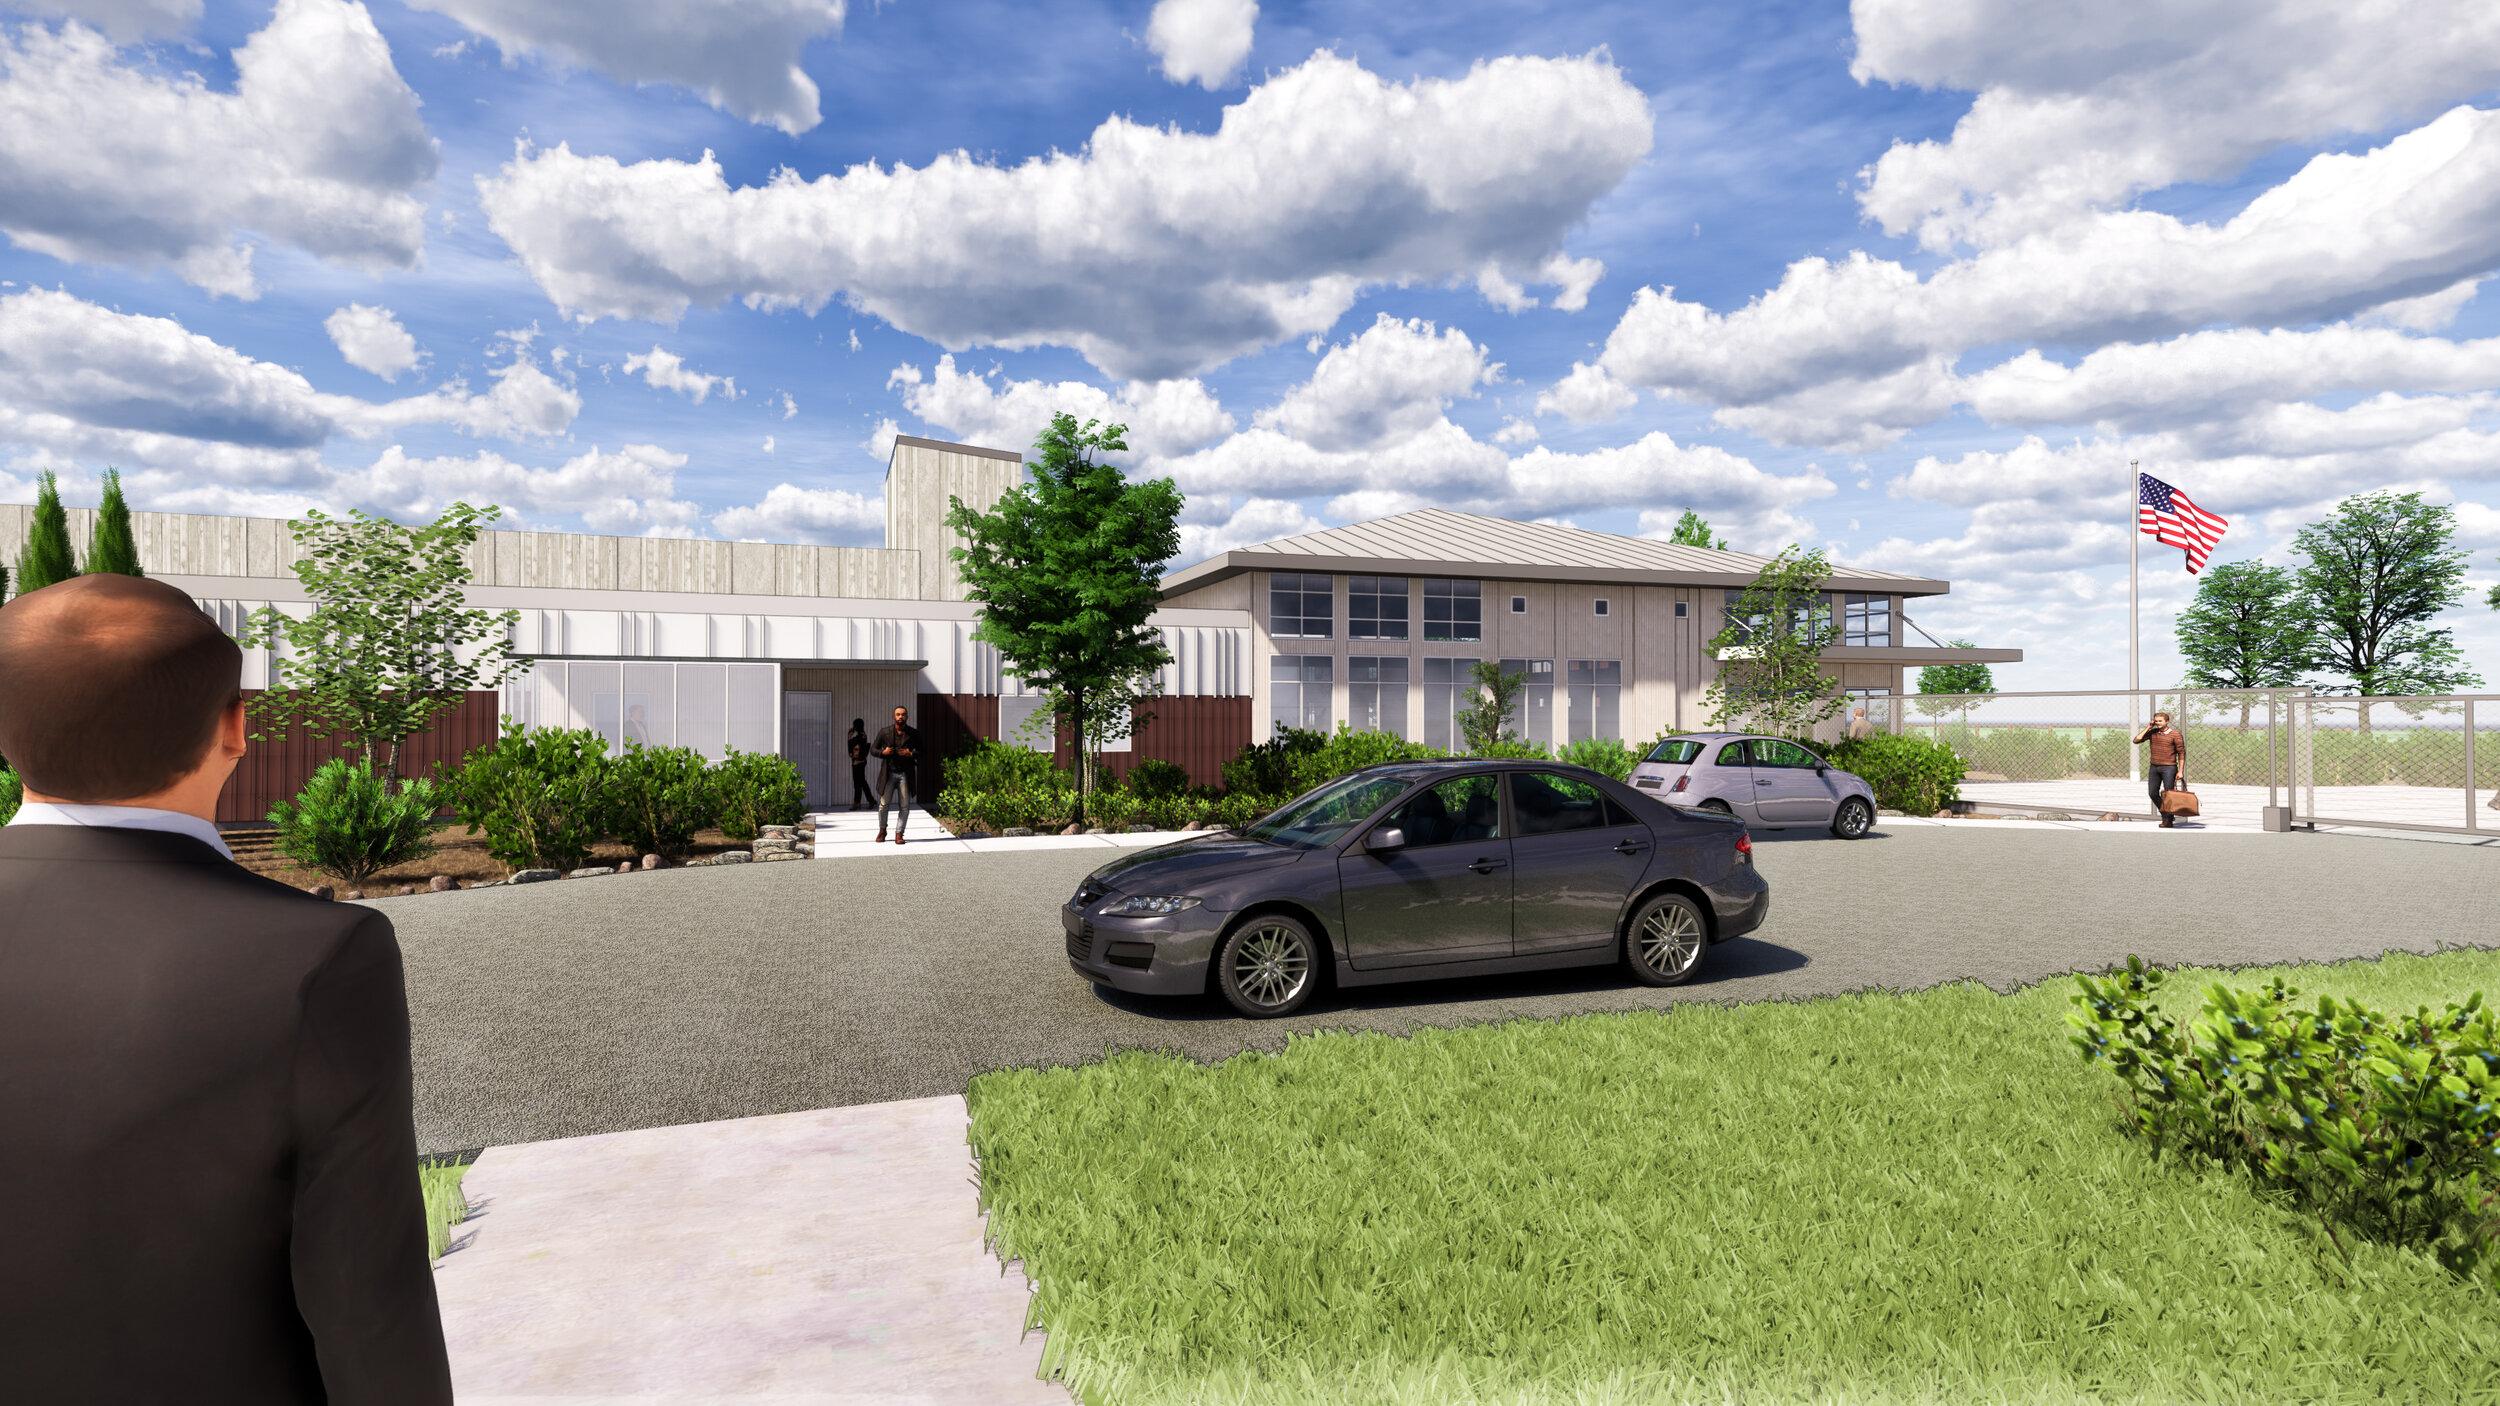 Clatsop County Jail Relocation Emerick Construction